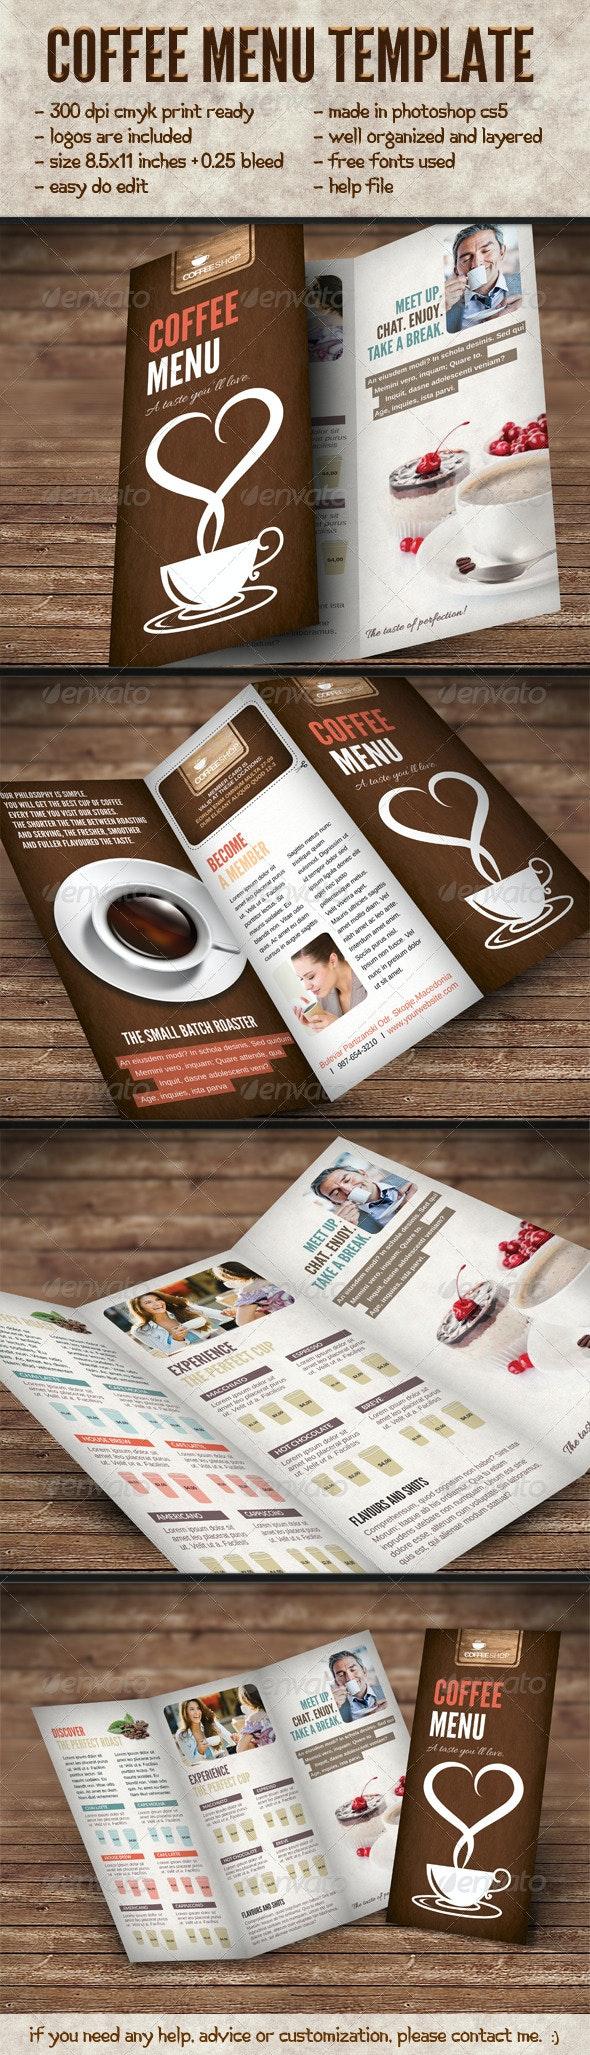 Elegant Coffee Menu Template - Food Menus Print Templates